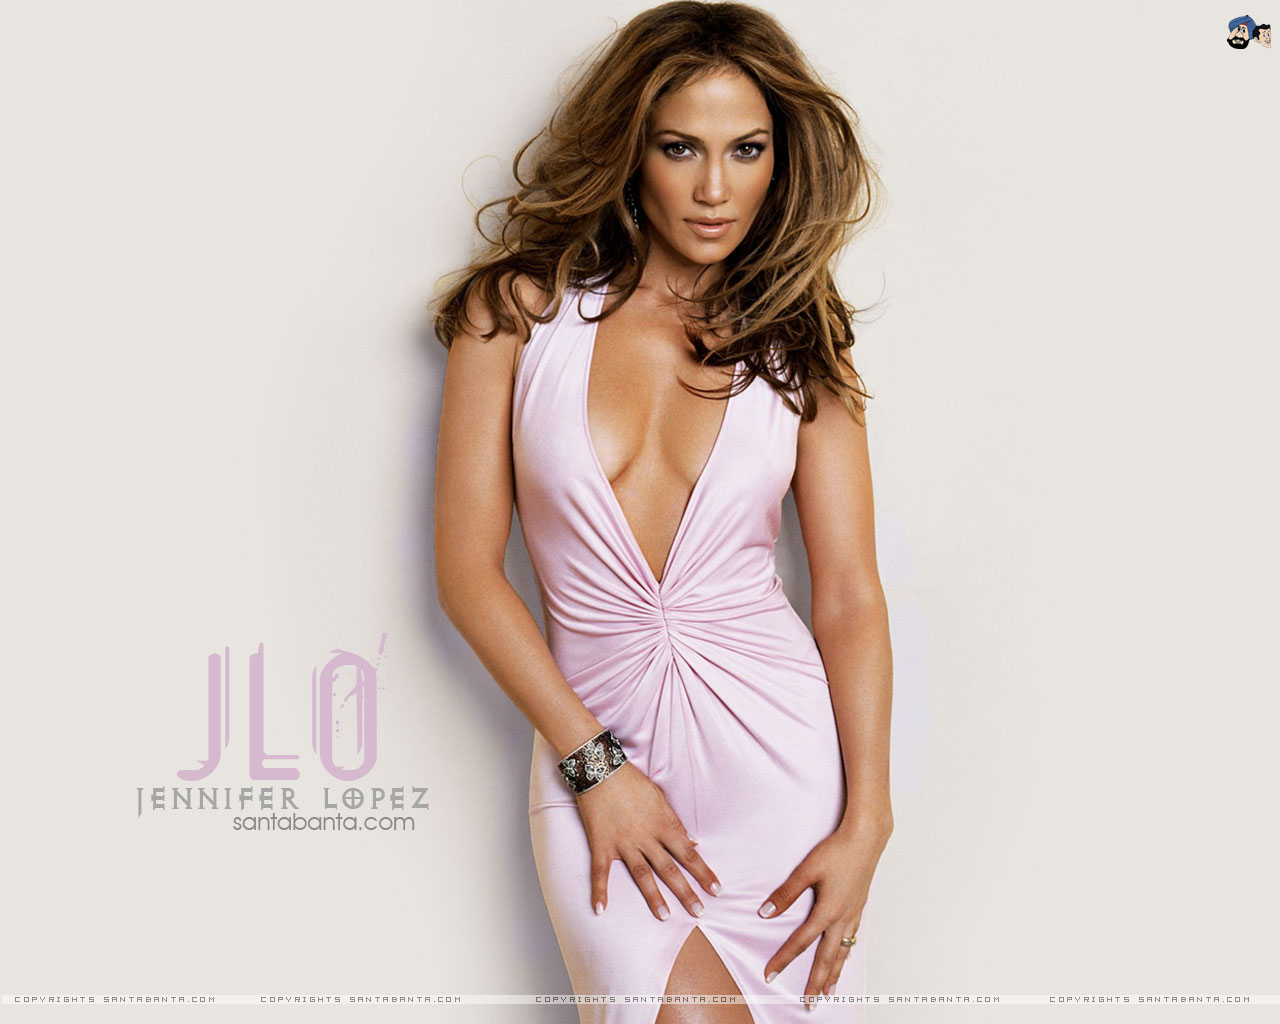 http://4.bp.blogspot.com/-zGbdoGwpmJc/UBYwJ1fIEbI/AAAAAAAAAMs/ArfQlkwrz-k/s1600/Jennifer-Lopez-Wallpaper-jennifer-lopez-25267083-1280-1024.jpg